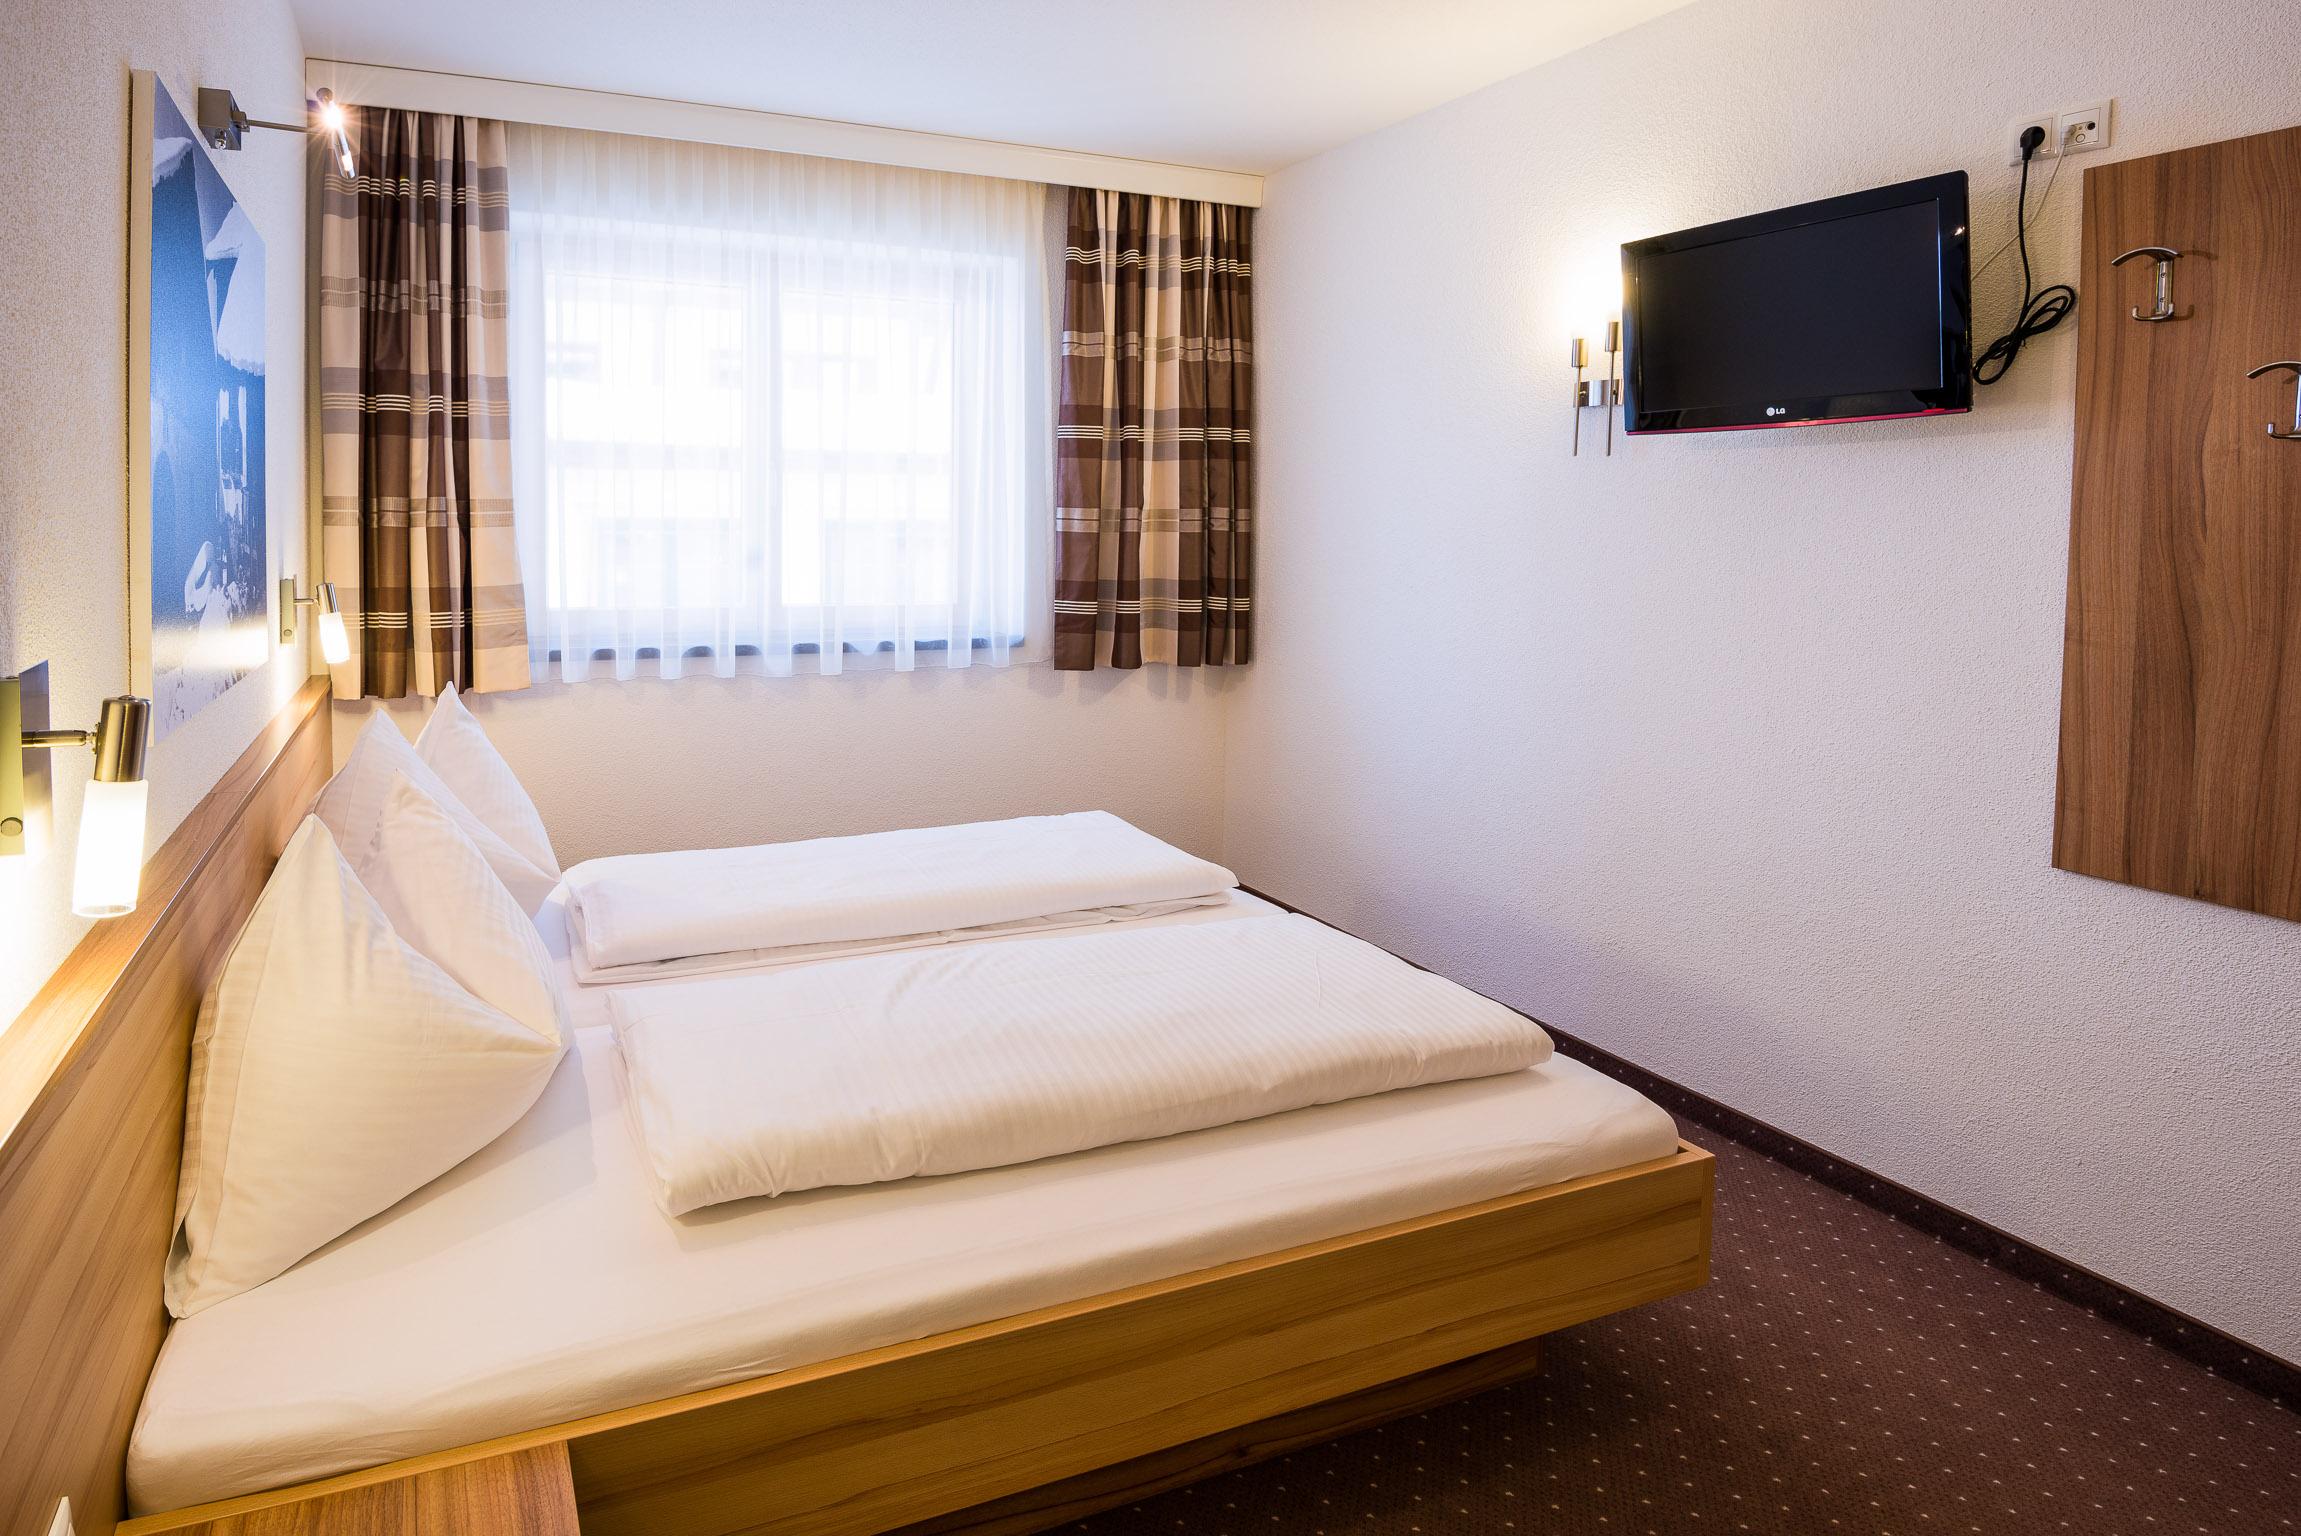 Apartment 2 Doppelbettzimmer